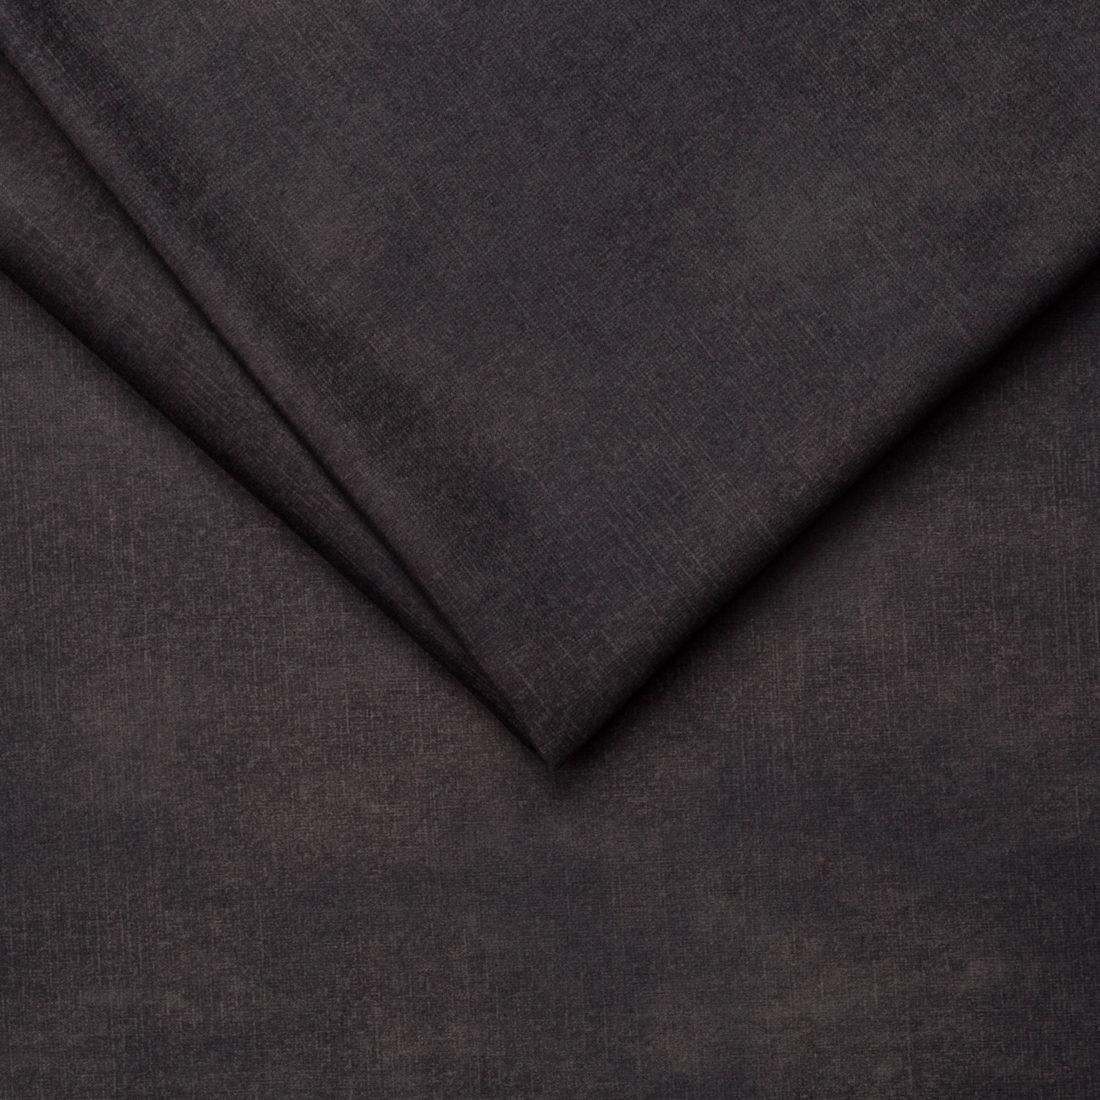 Меблева тканина Palladium 18 Elephant, велюр